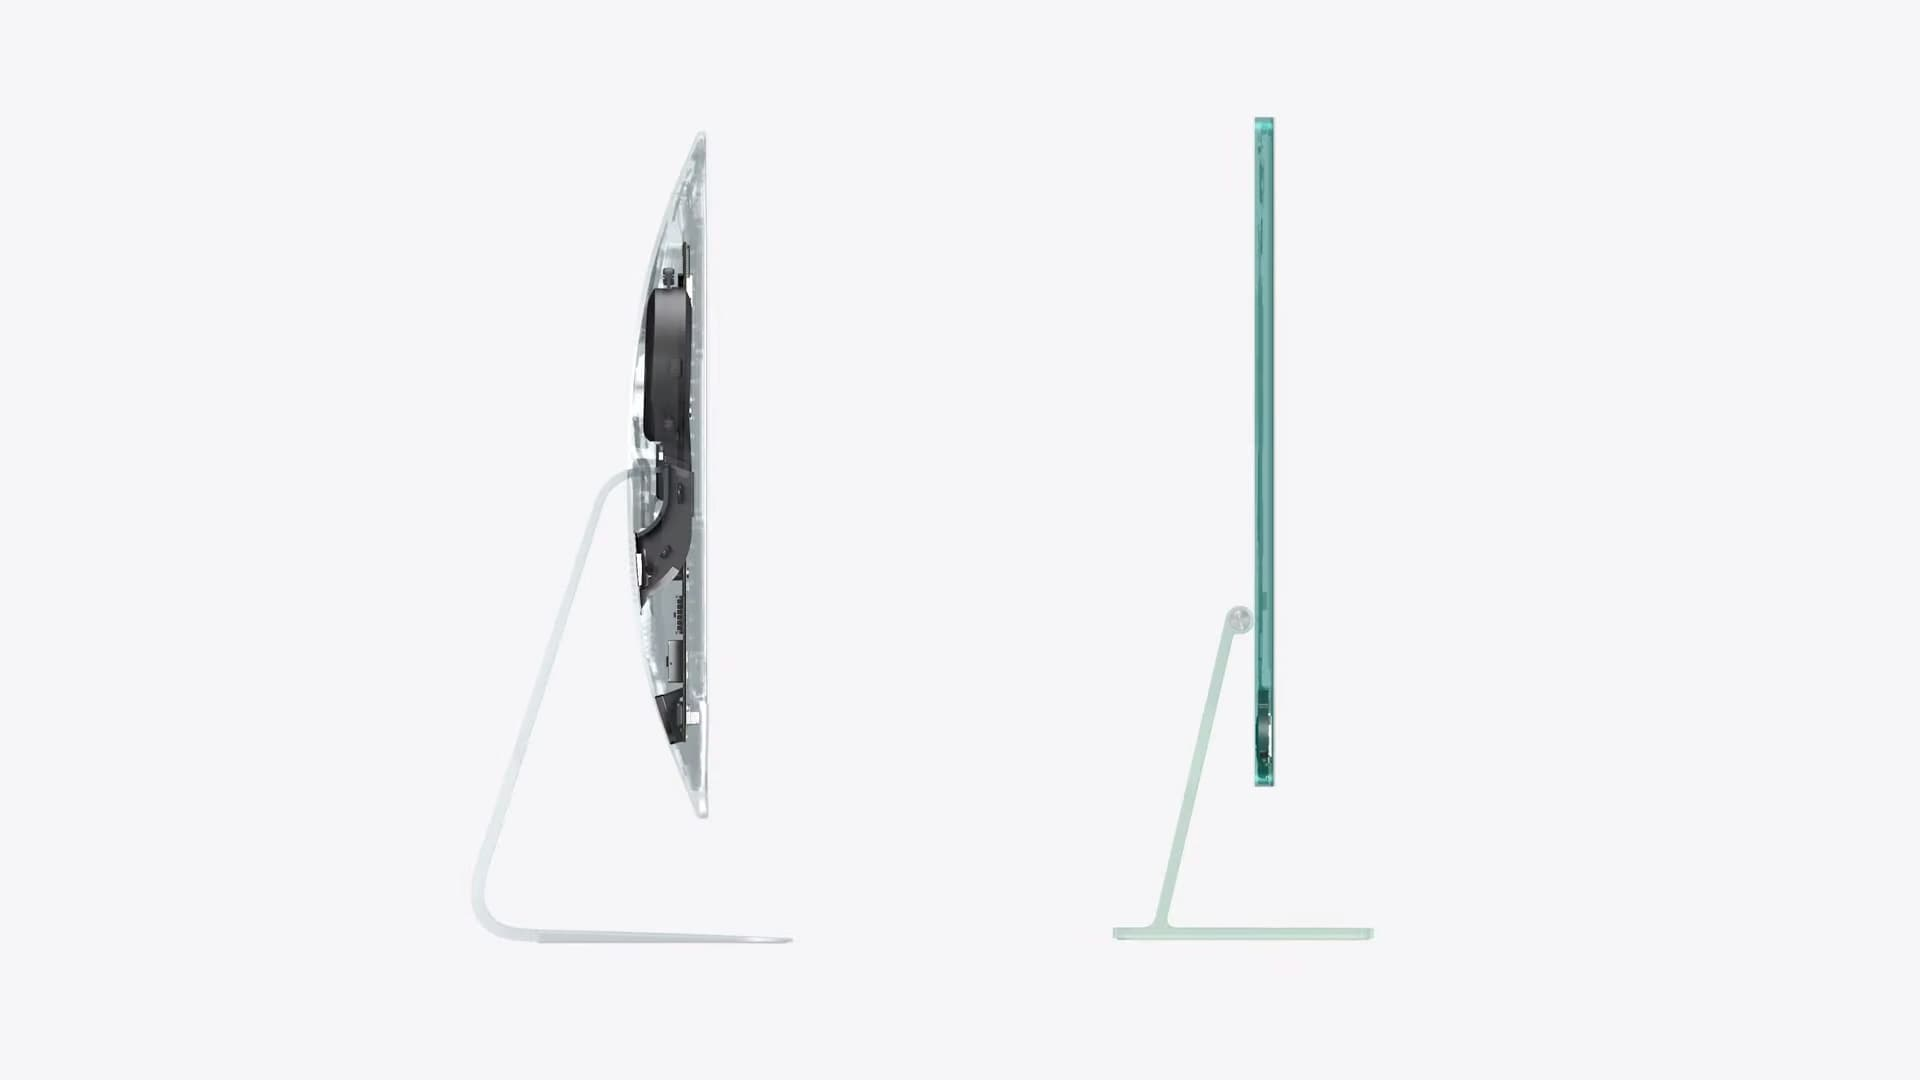 M1 iMac 2021 台灣正式開賣上市!7款顏色、售價39900起3